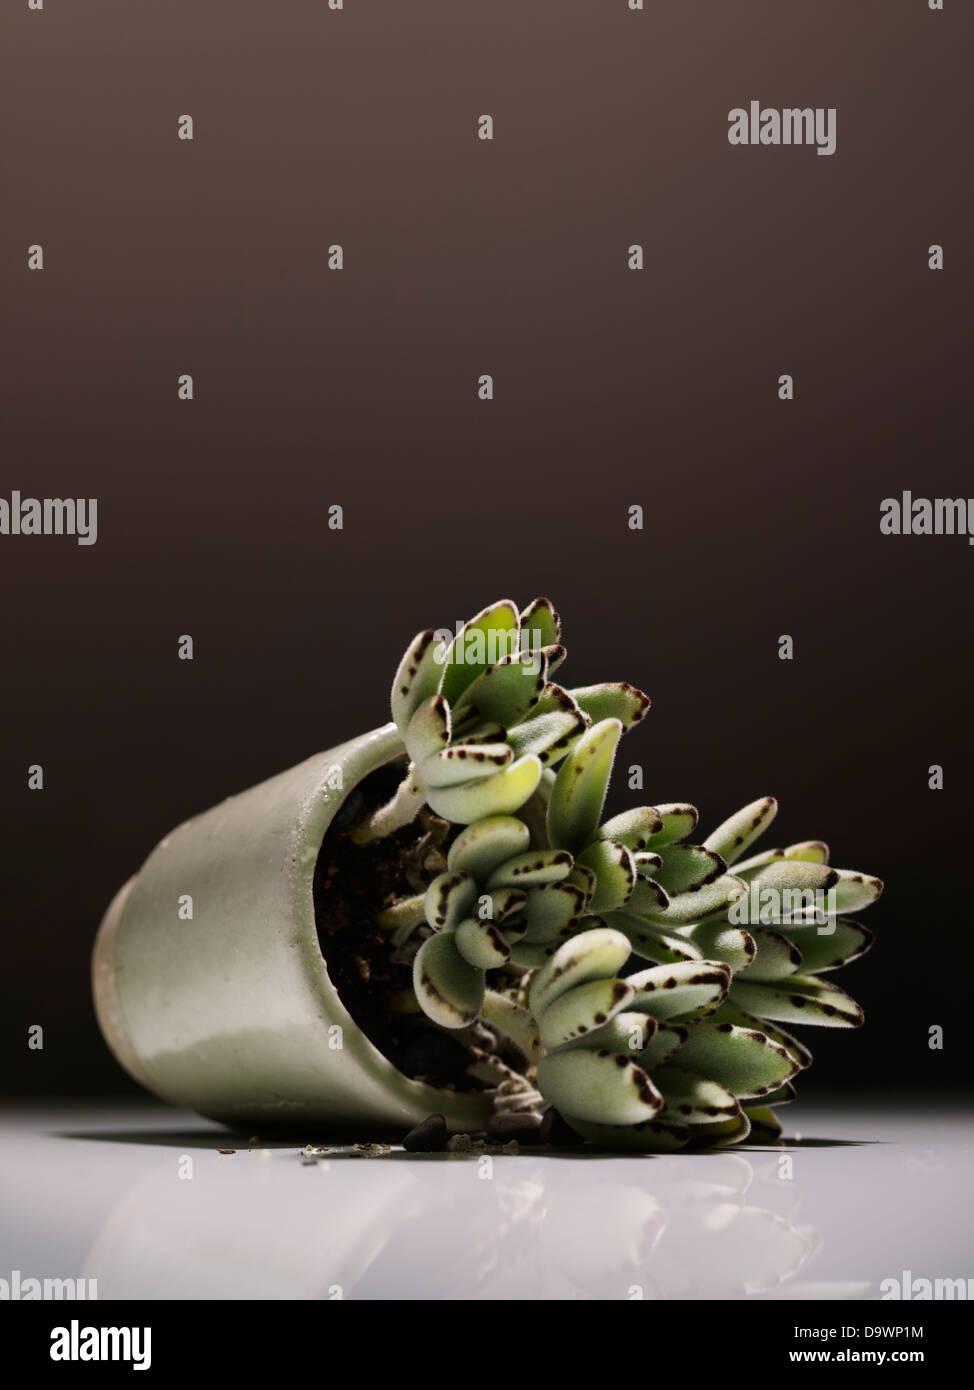 Planta Imagen De Stock